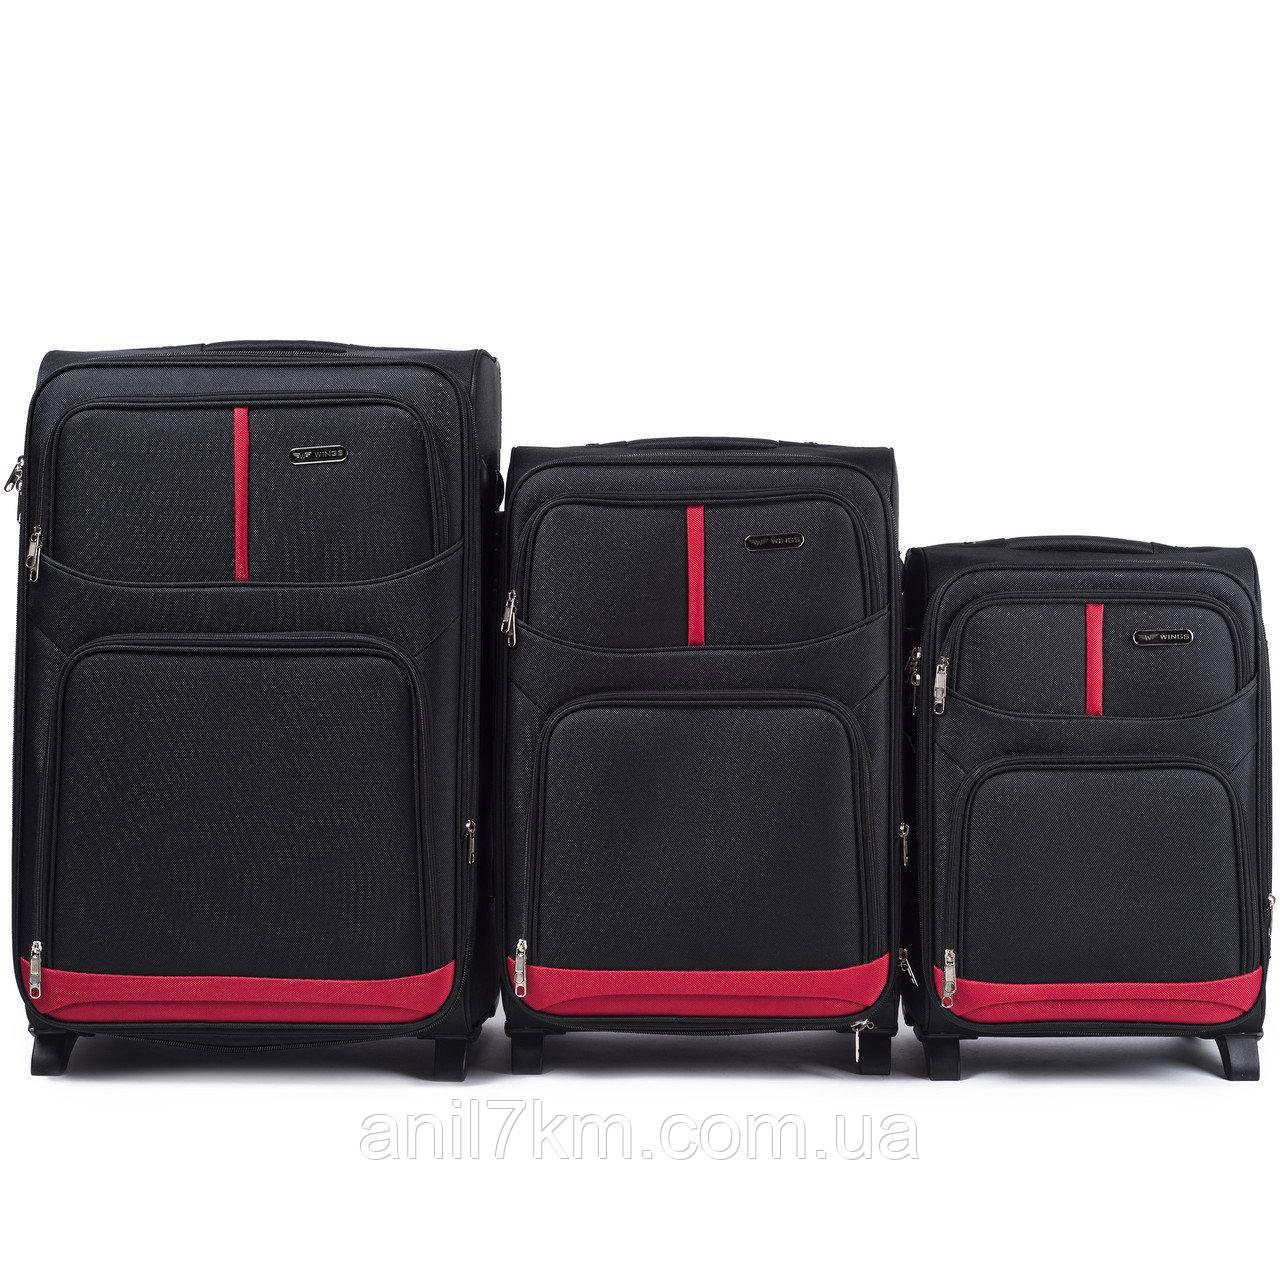 Набор чемоданов 3 штуки в 1 Wings 206 на 2 колесах